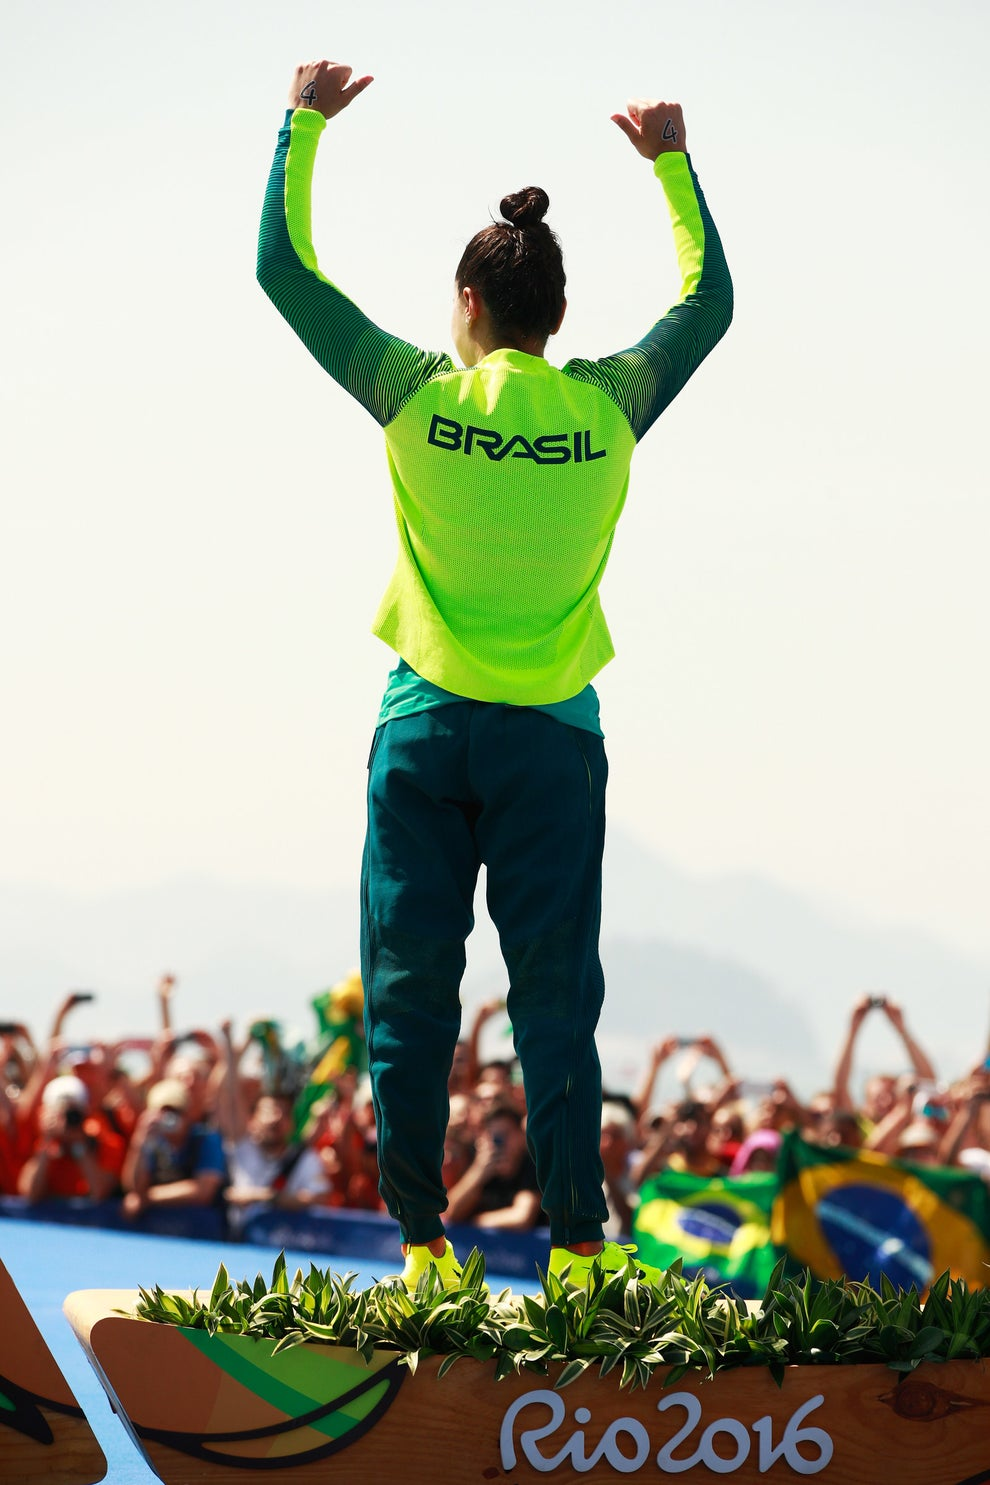 Aqui é Brasil.